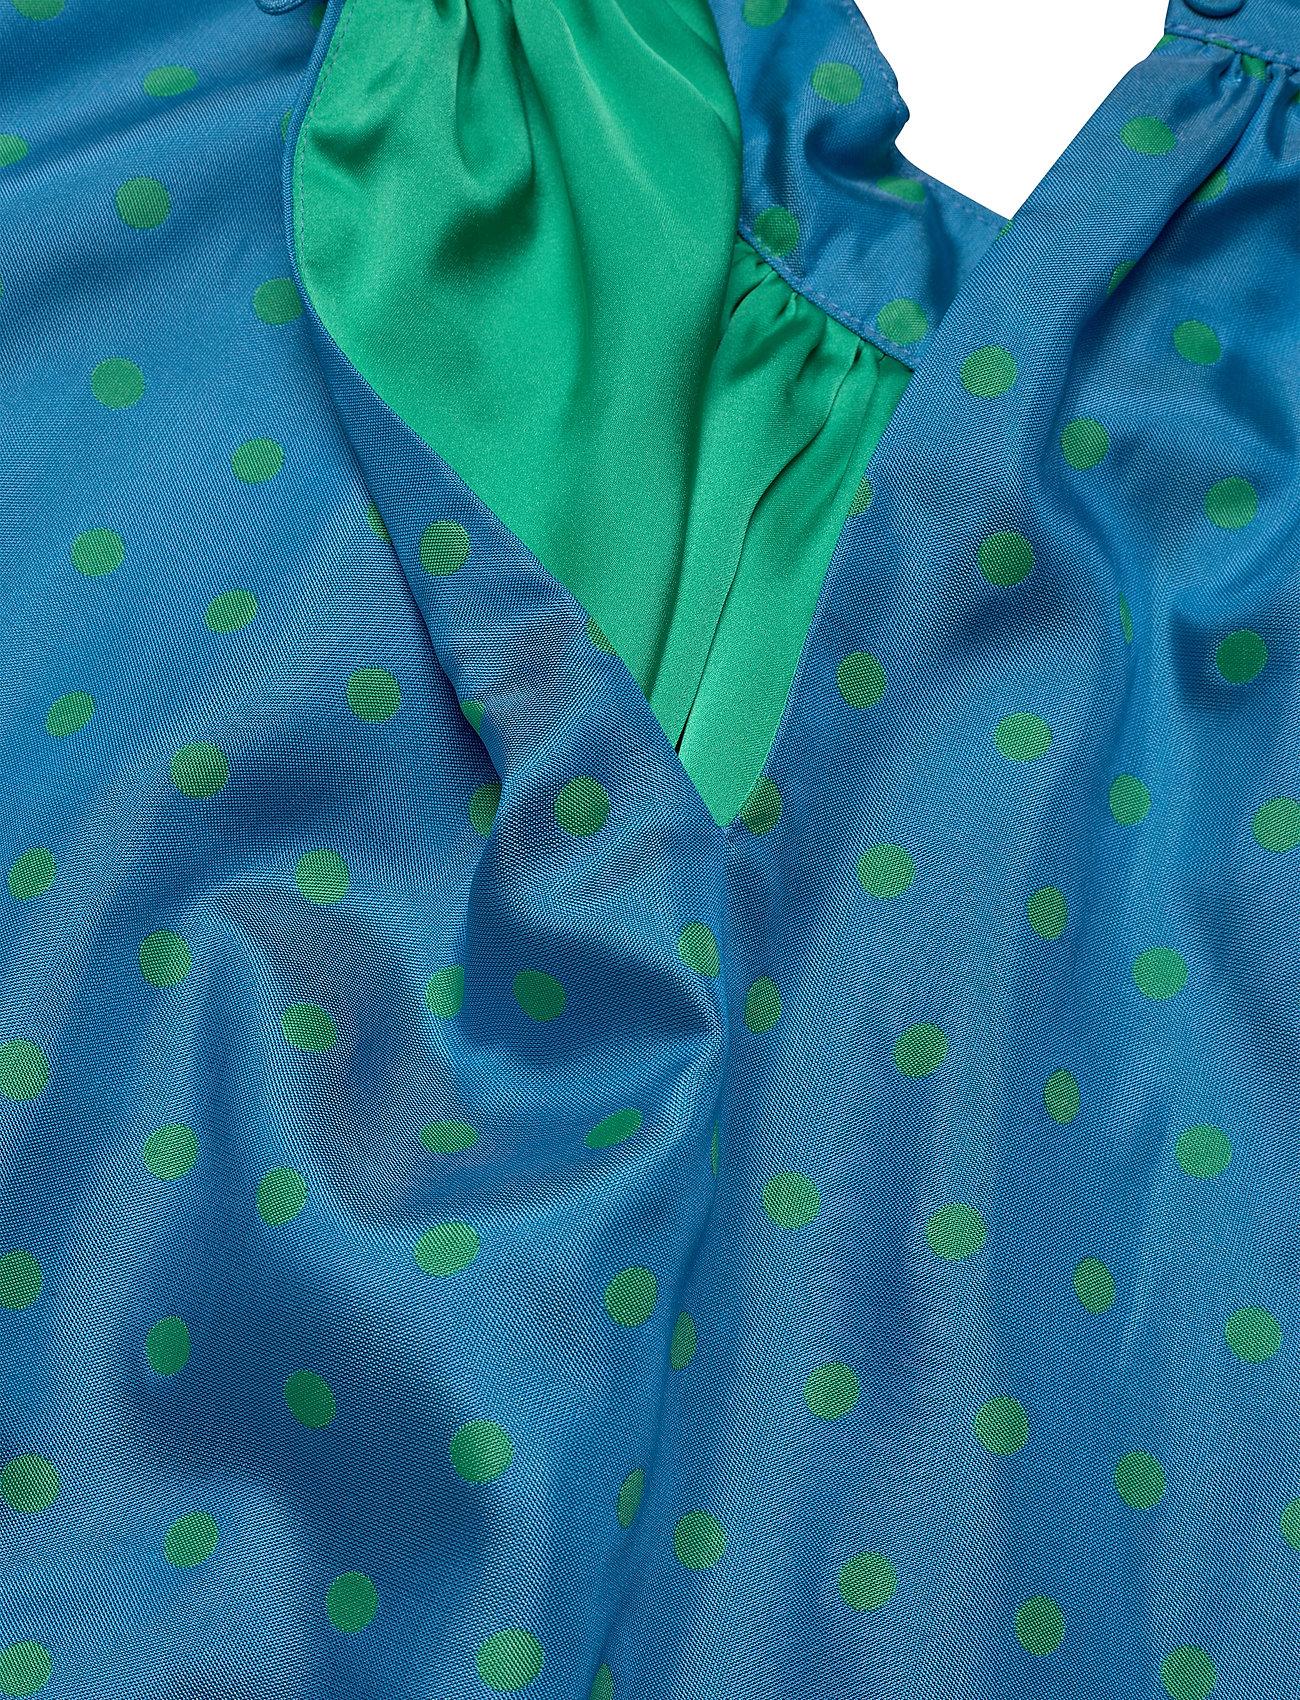 STINE GOYA - Wendy, 870 Green Blue Dots - midiklänningar - blue green - 5